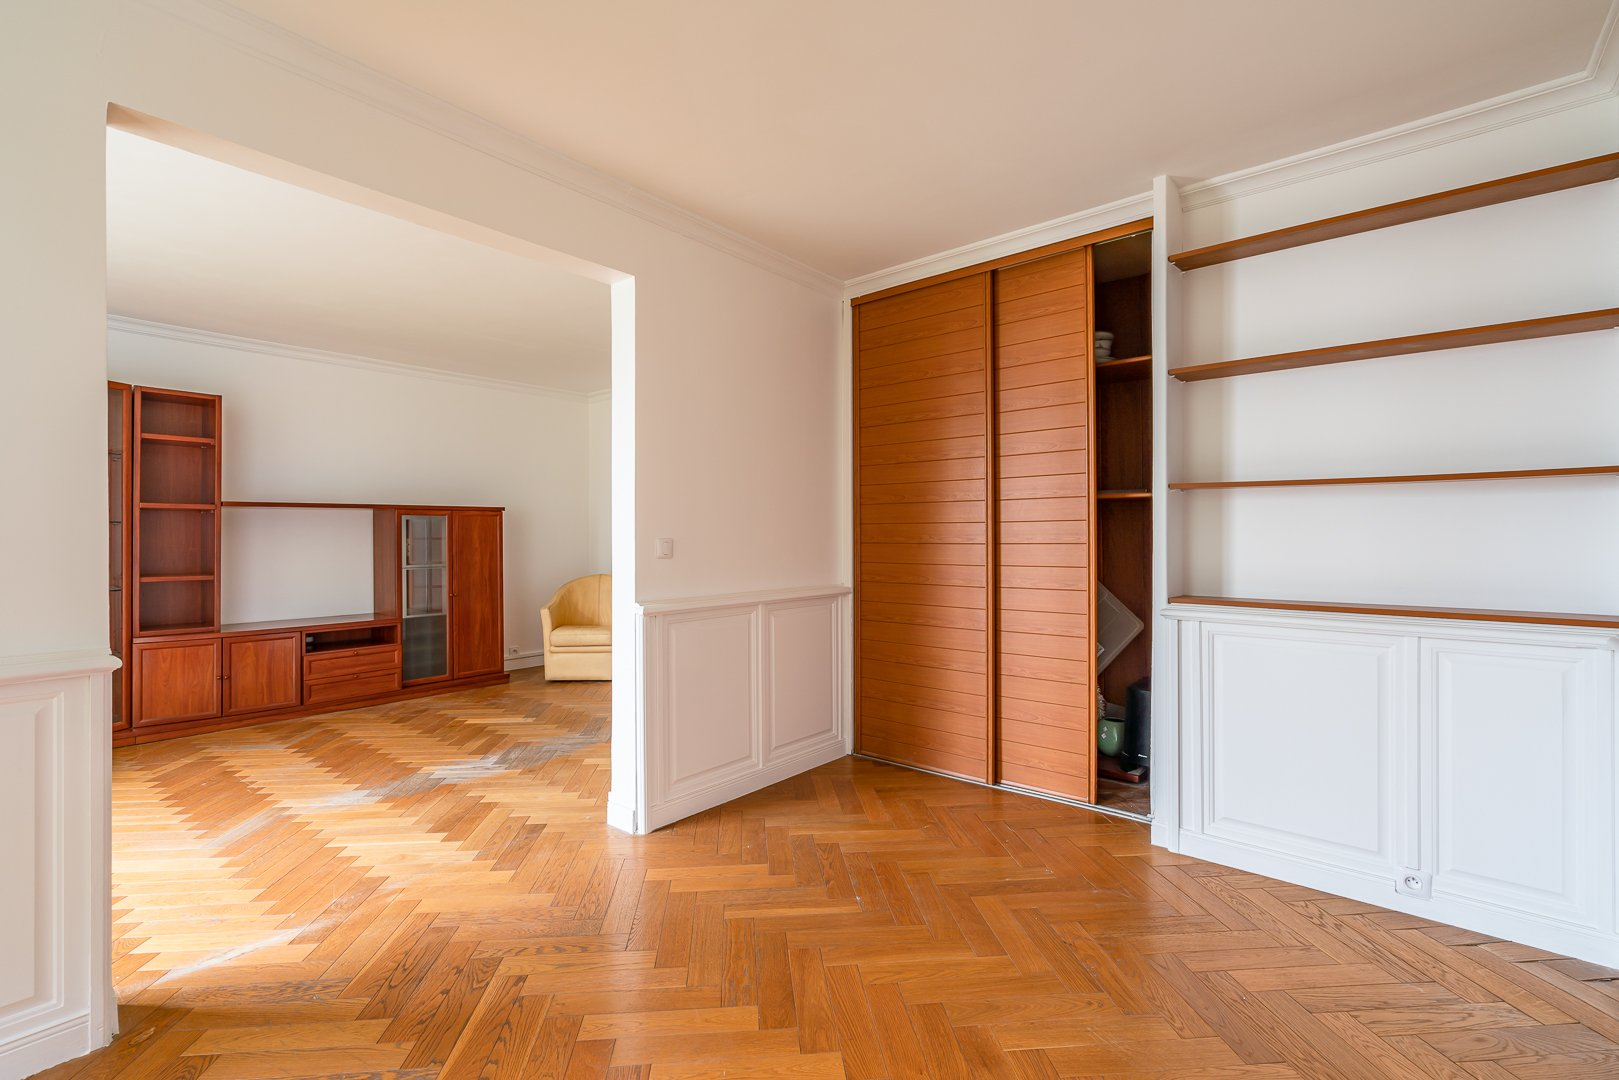 APPARTEMENT 5 pièces, 98 m² Neuilly Plaisance